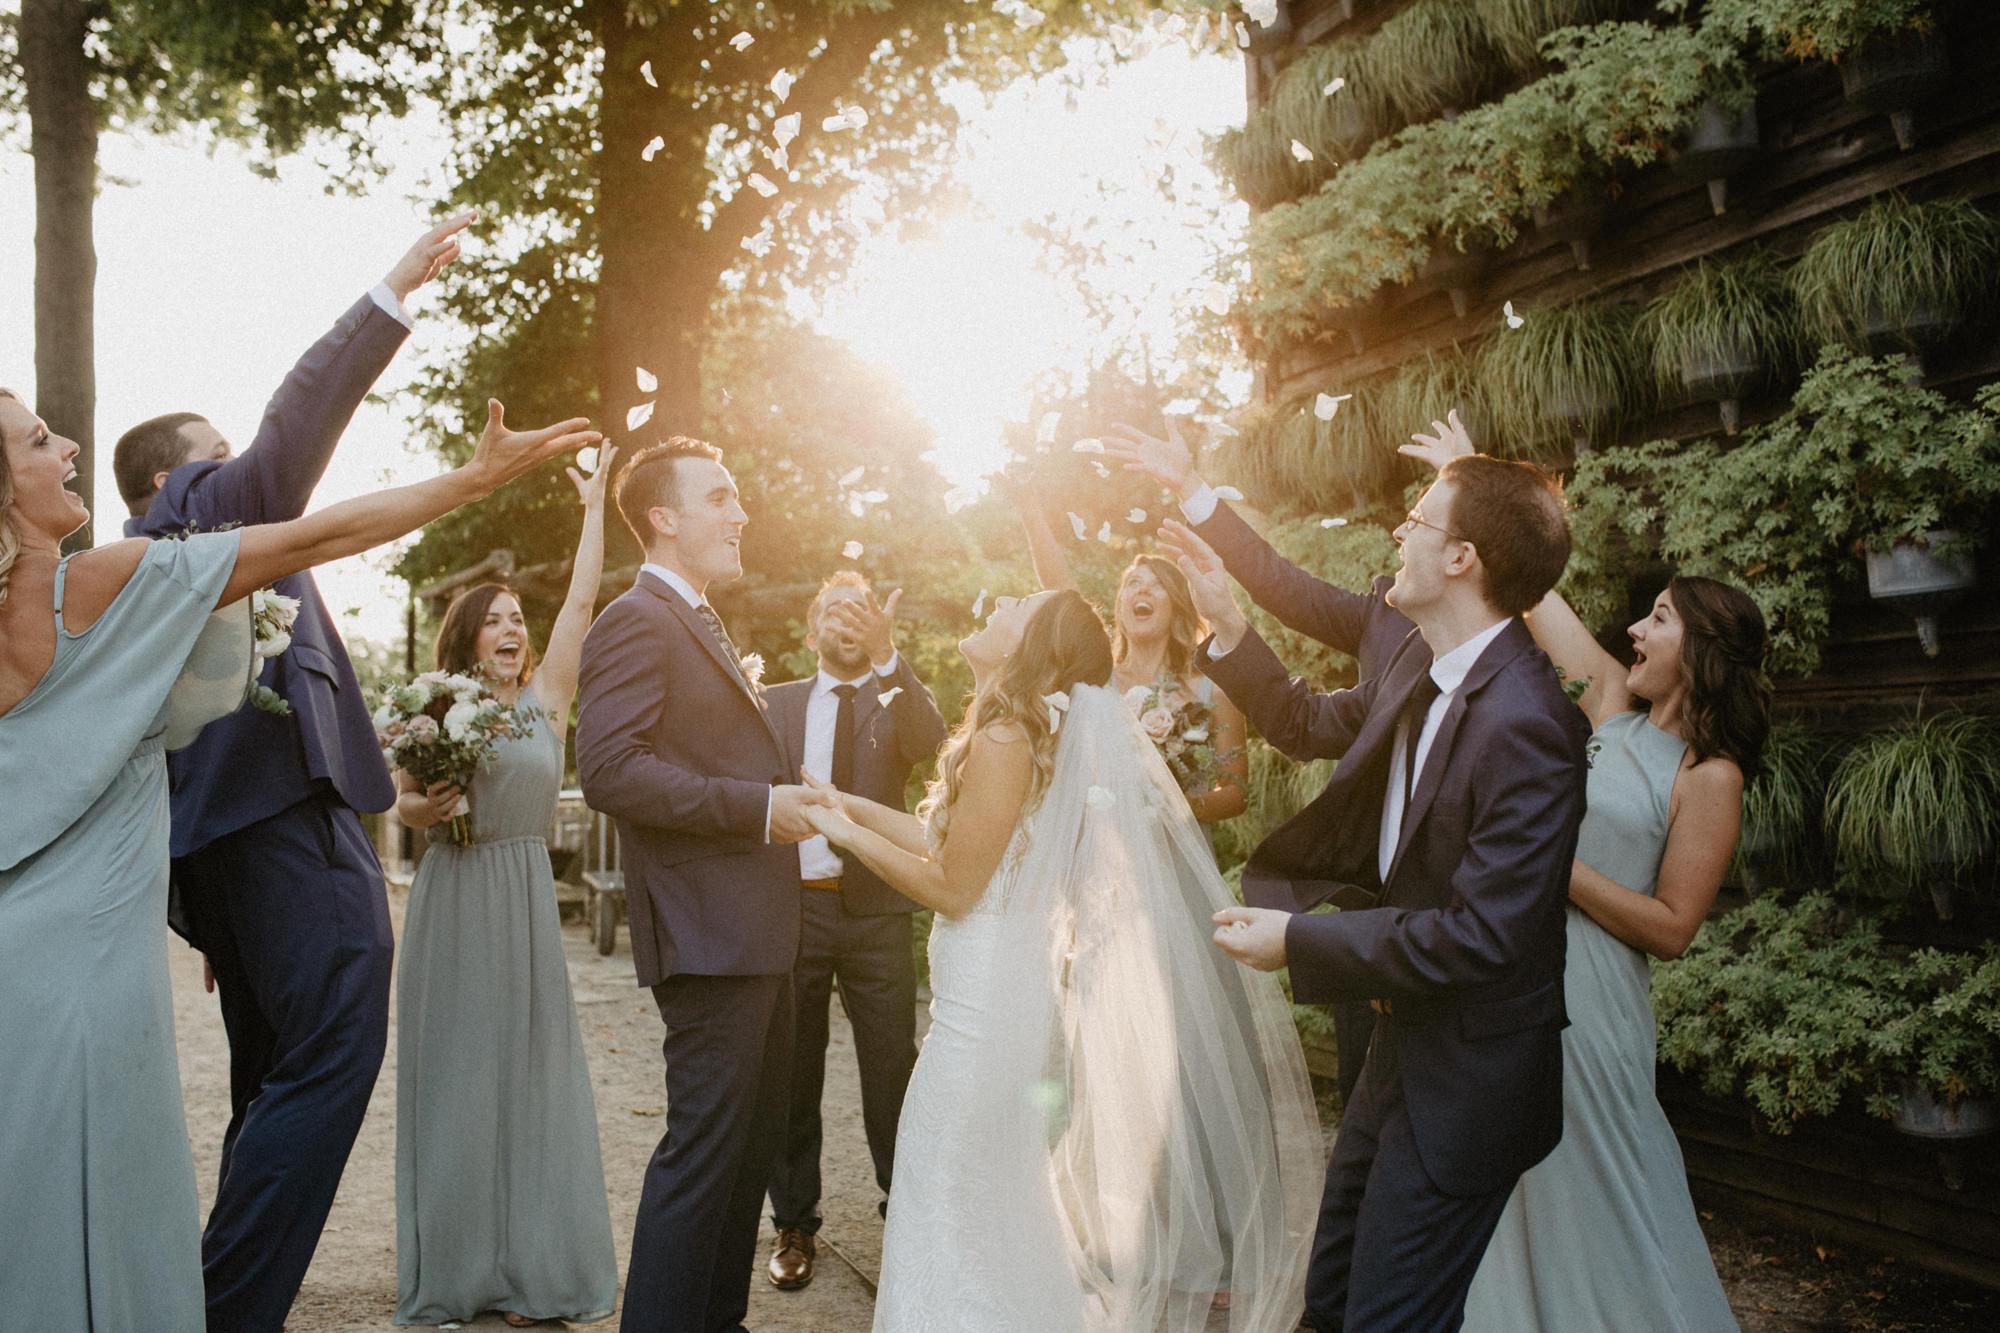 terrain-events-wedding-photographer-43.jpg